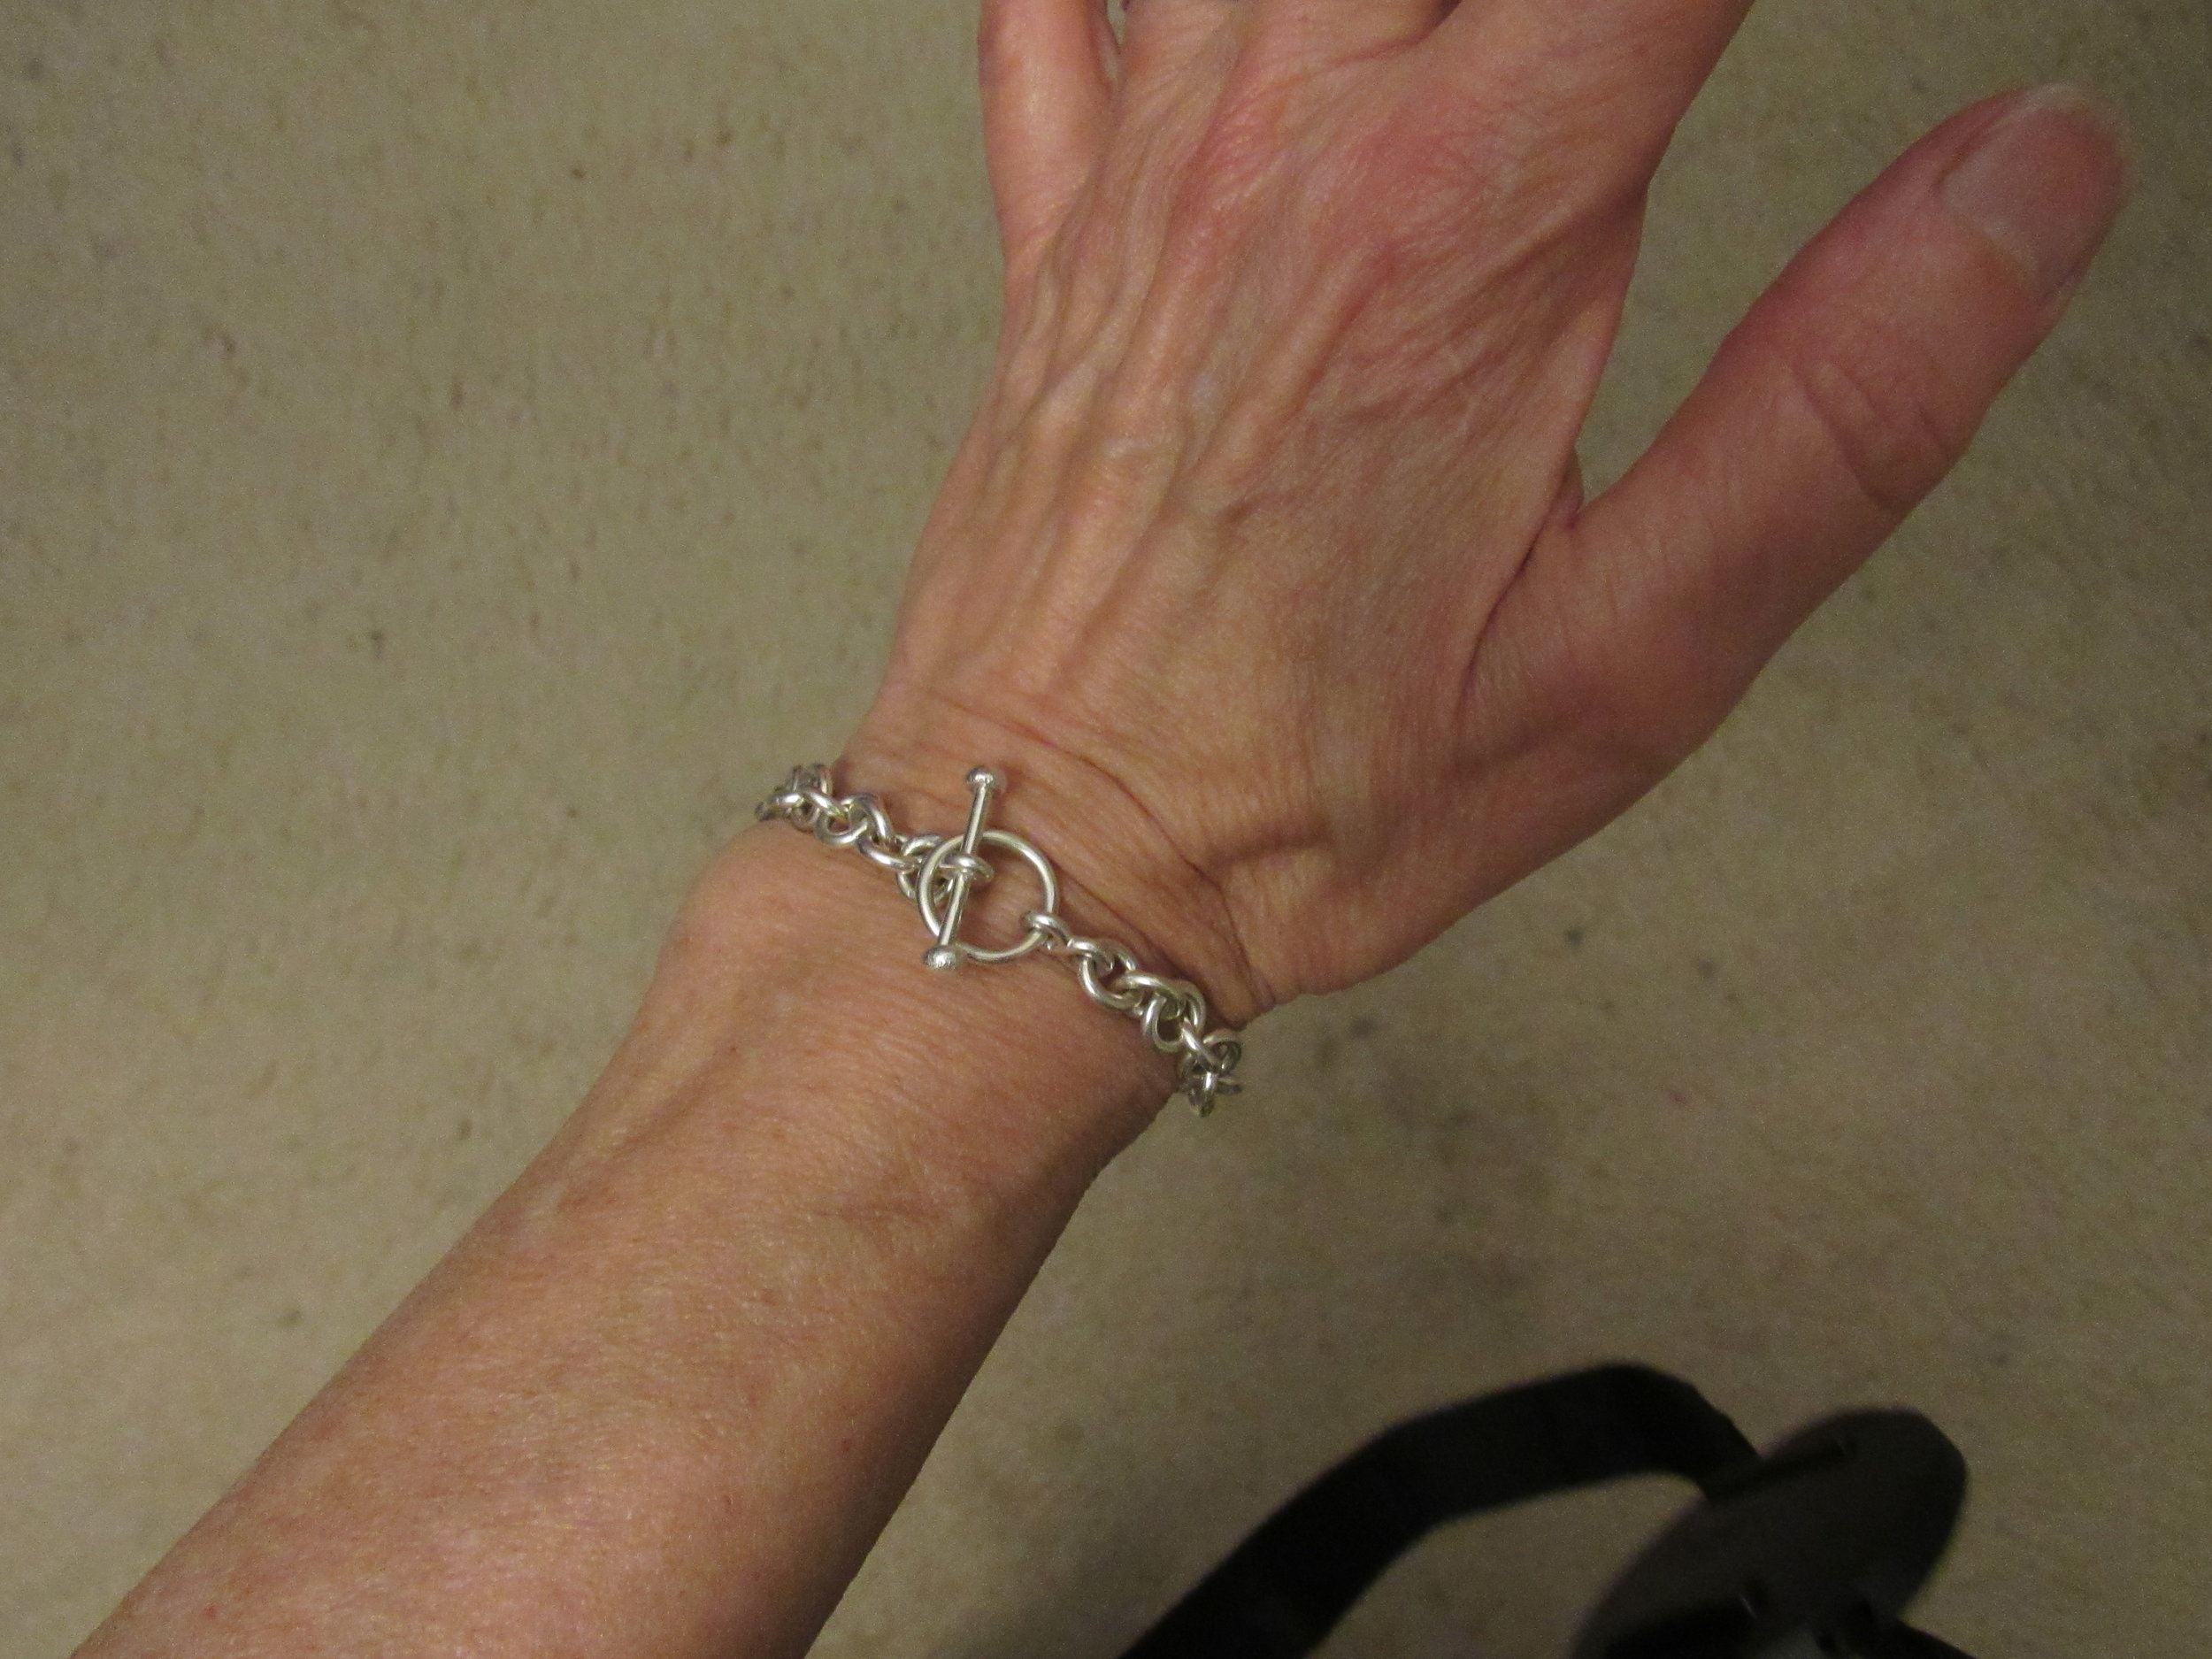 Much better than that paper hospital bracelet!